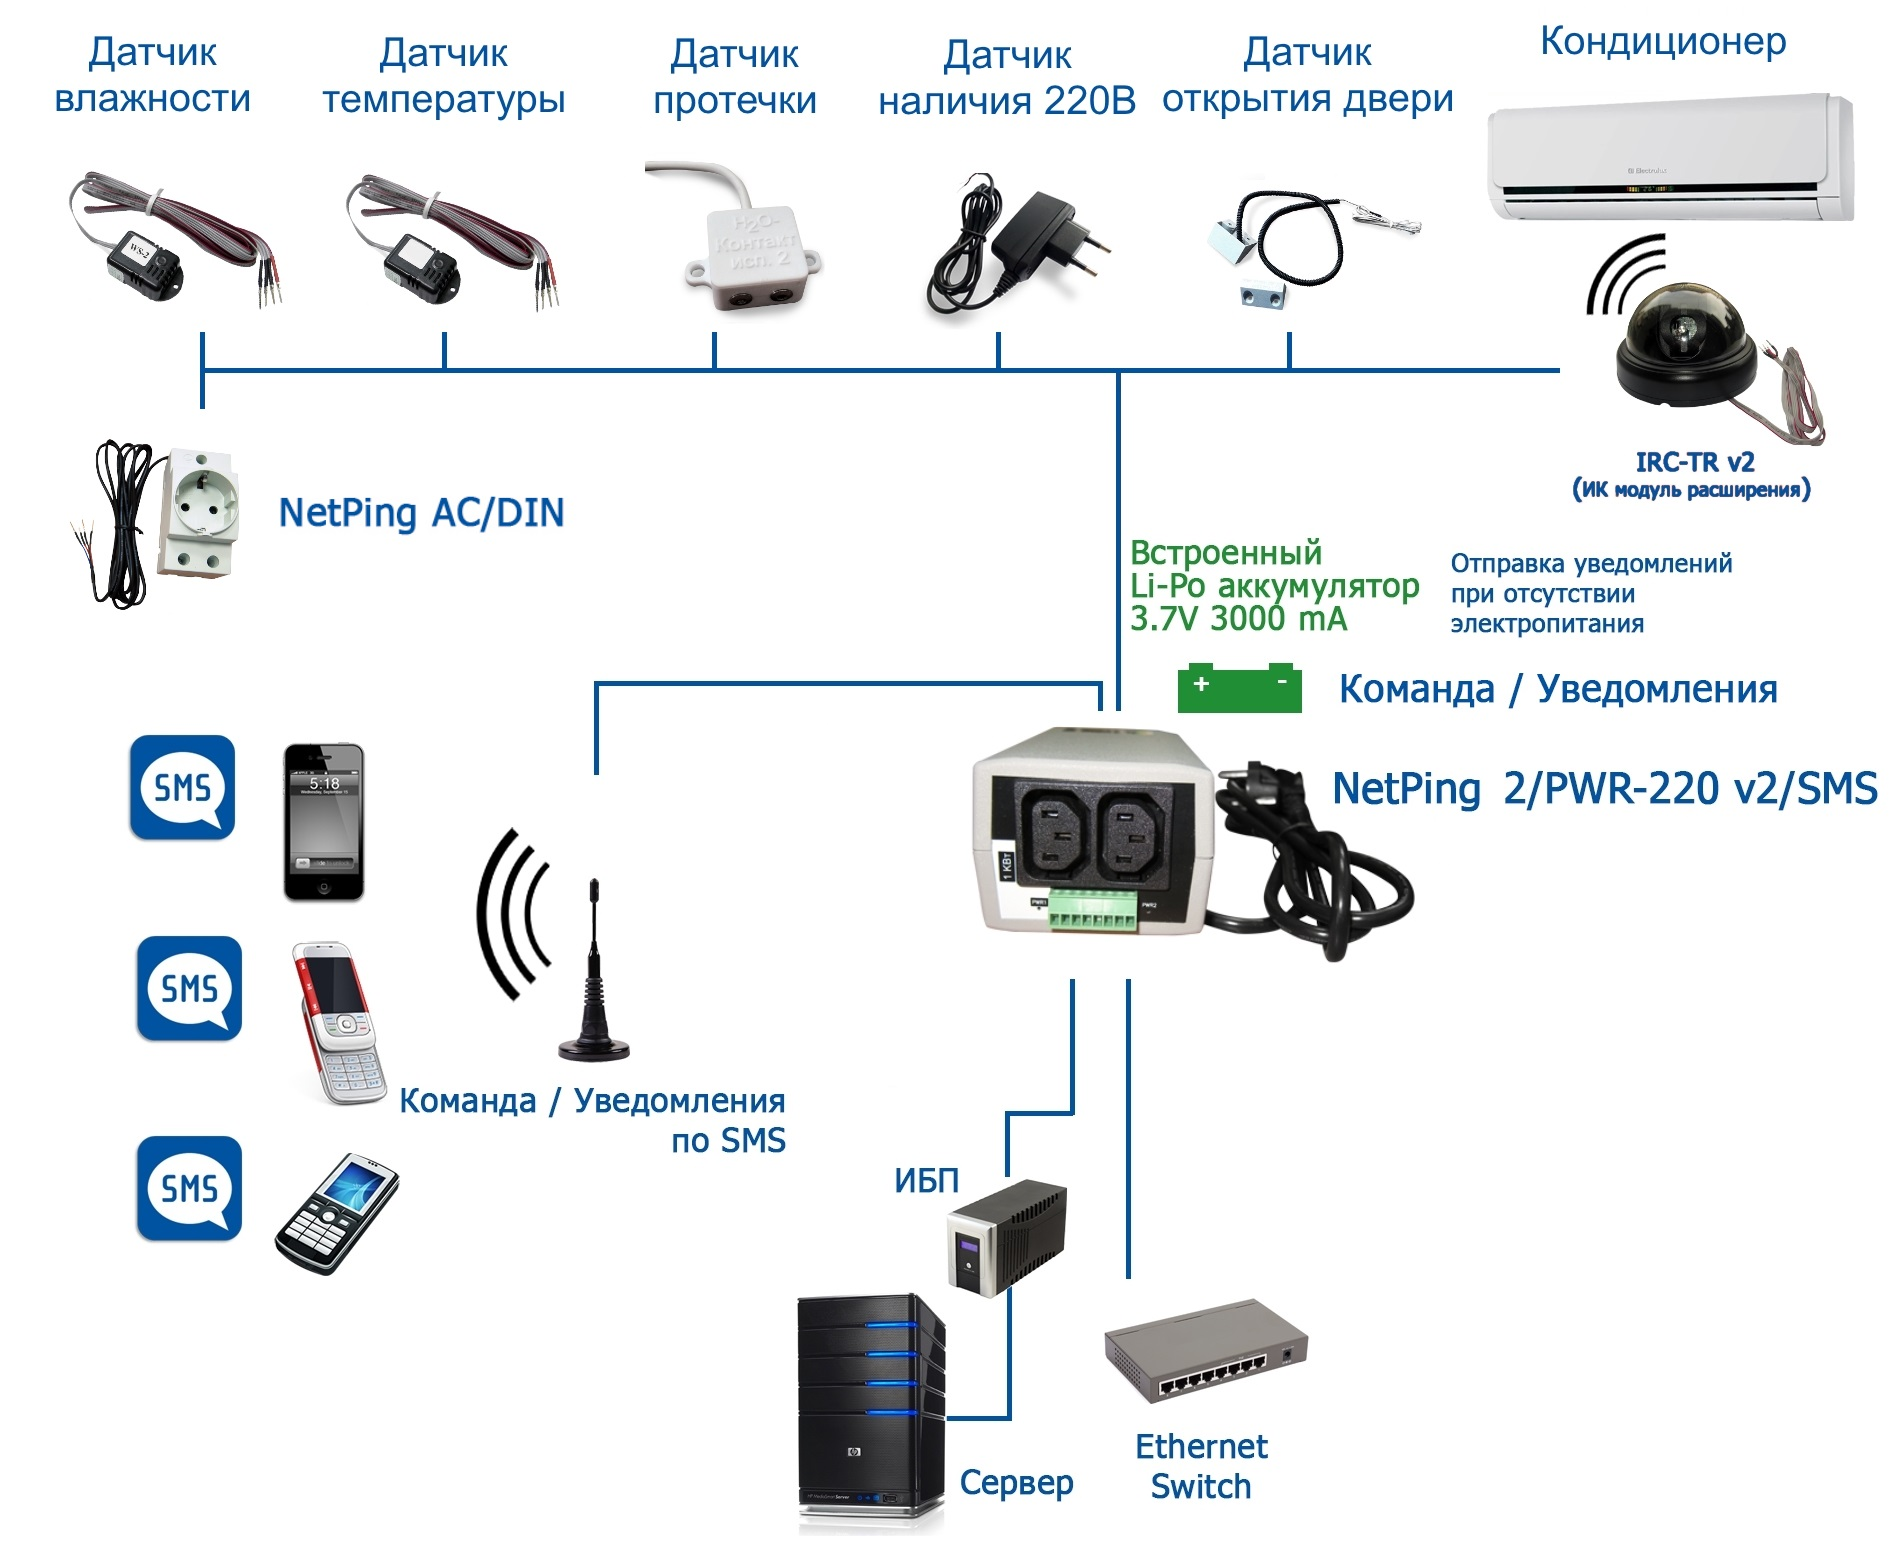 NetPing 2PWR-220 v2SMS - подключение датчиков